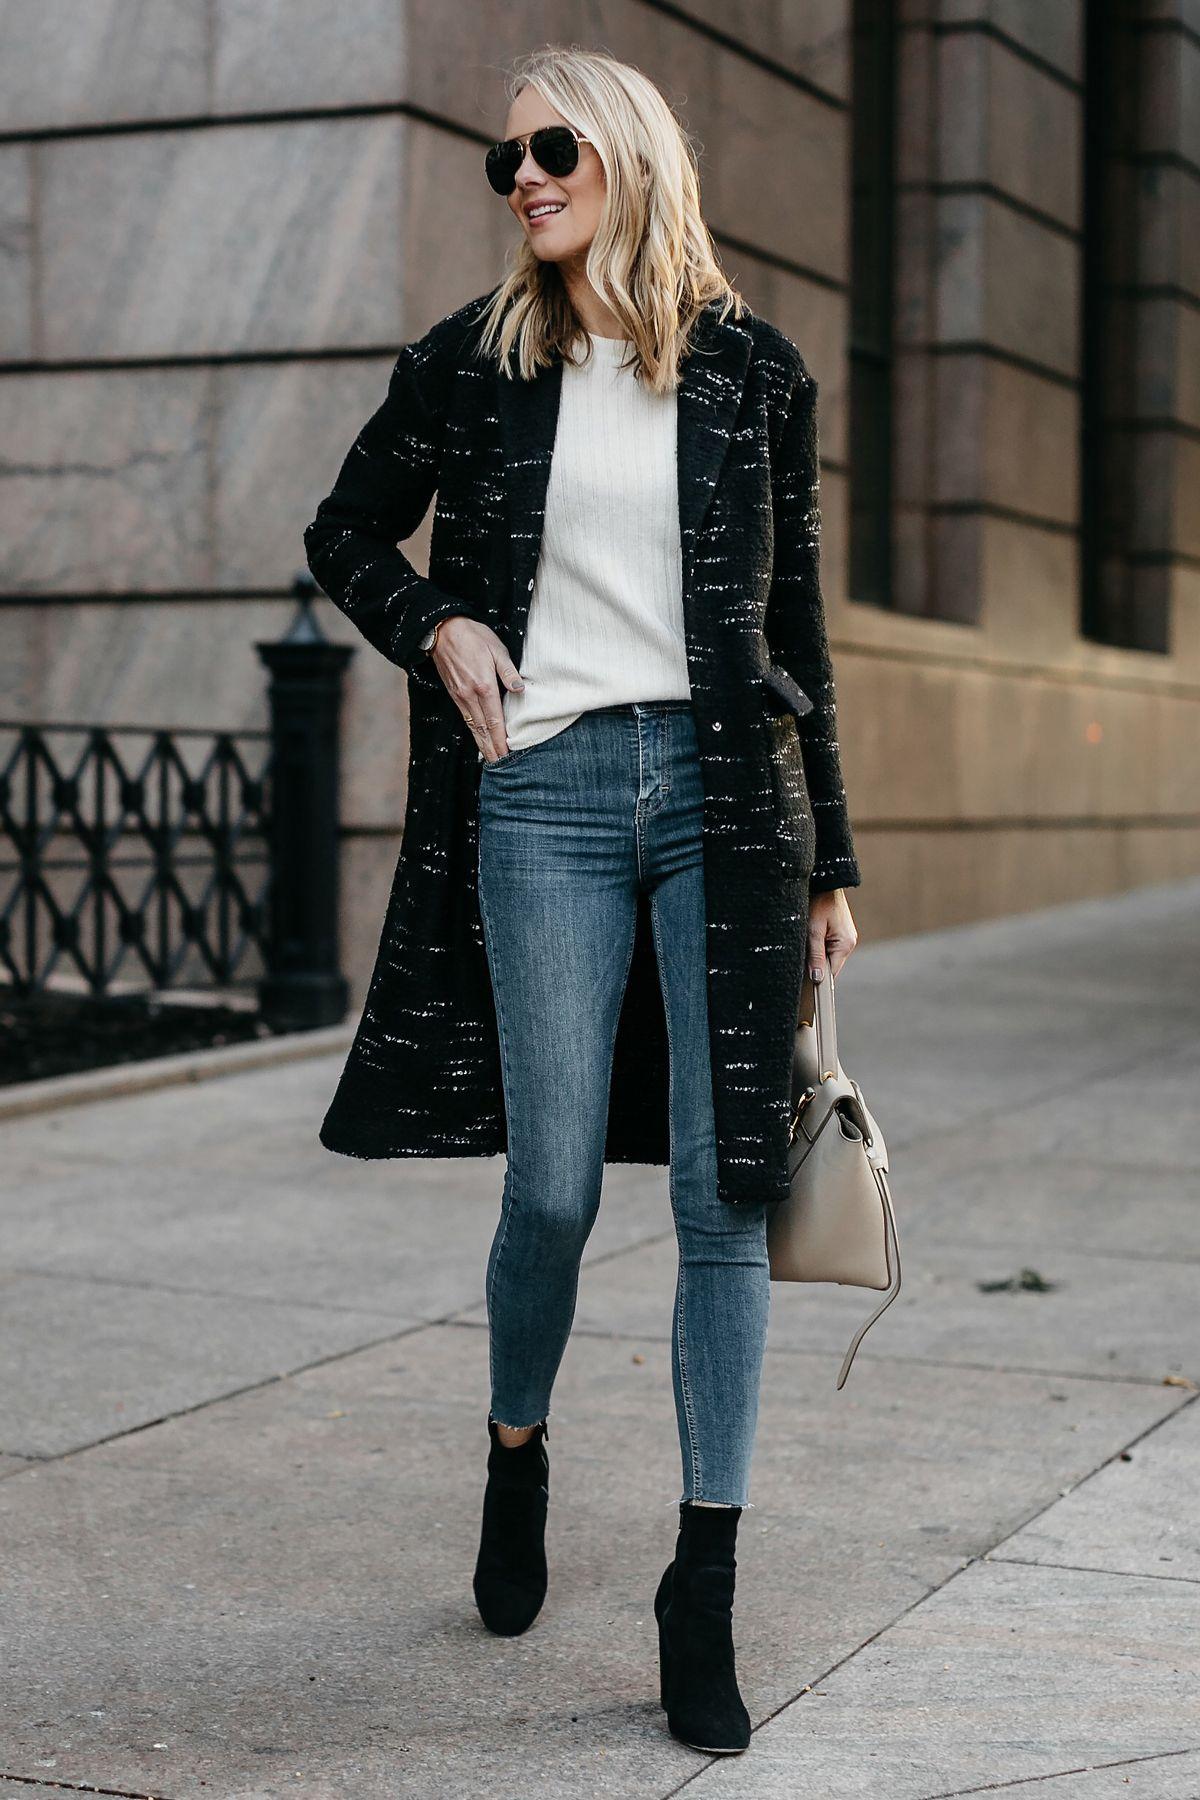 a585a99ba3a8 Blonde Woman Wearing Black Sweater Coat White Sweater Denim Skinny Jeans  Black Booties Fashion Jackson Dallas Blogger Fashion Blogger Street Style